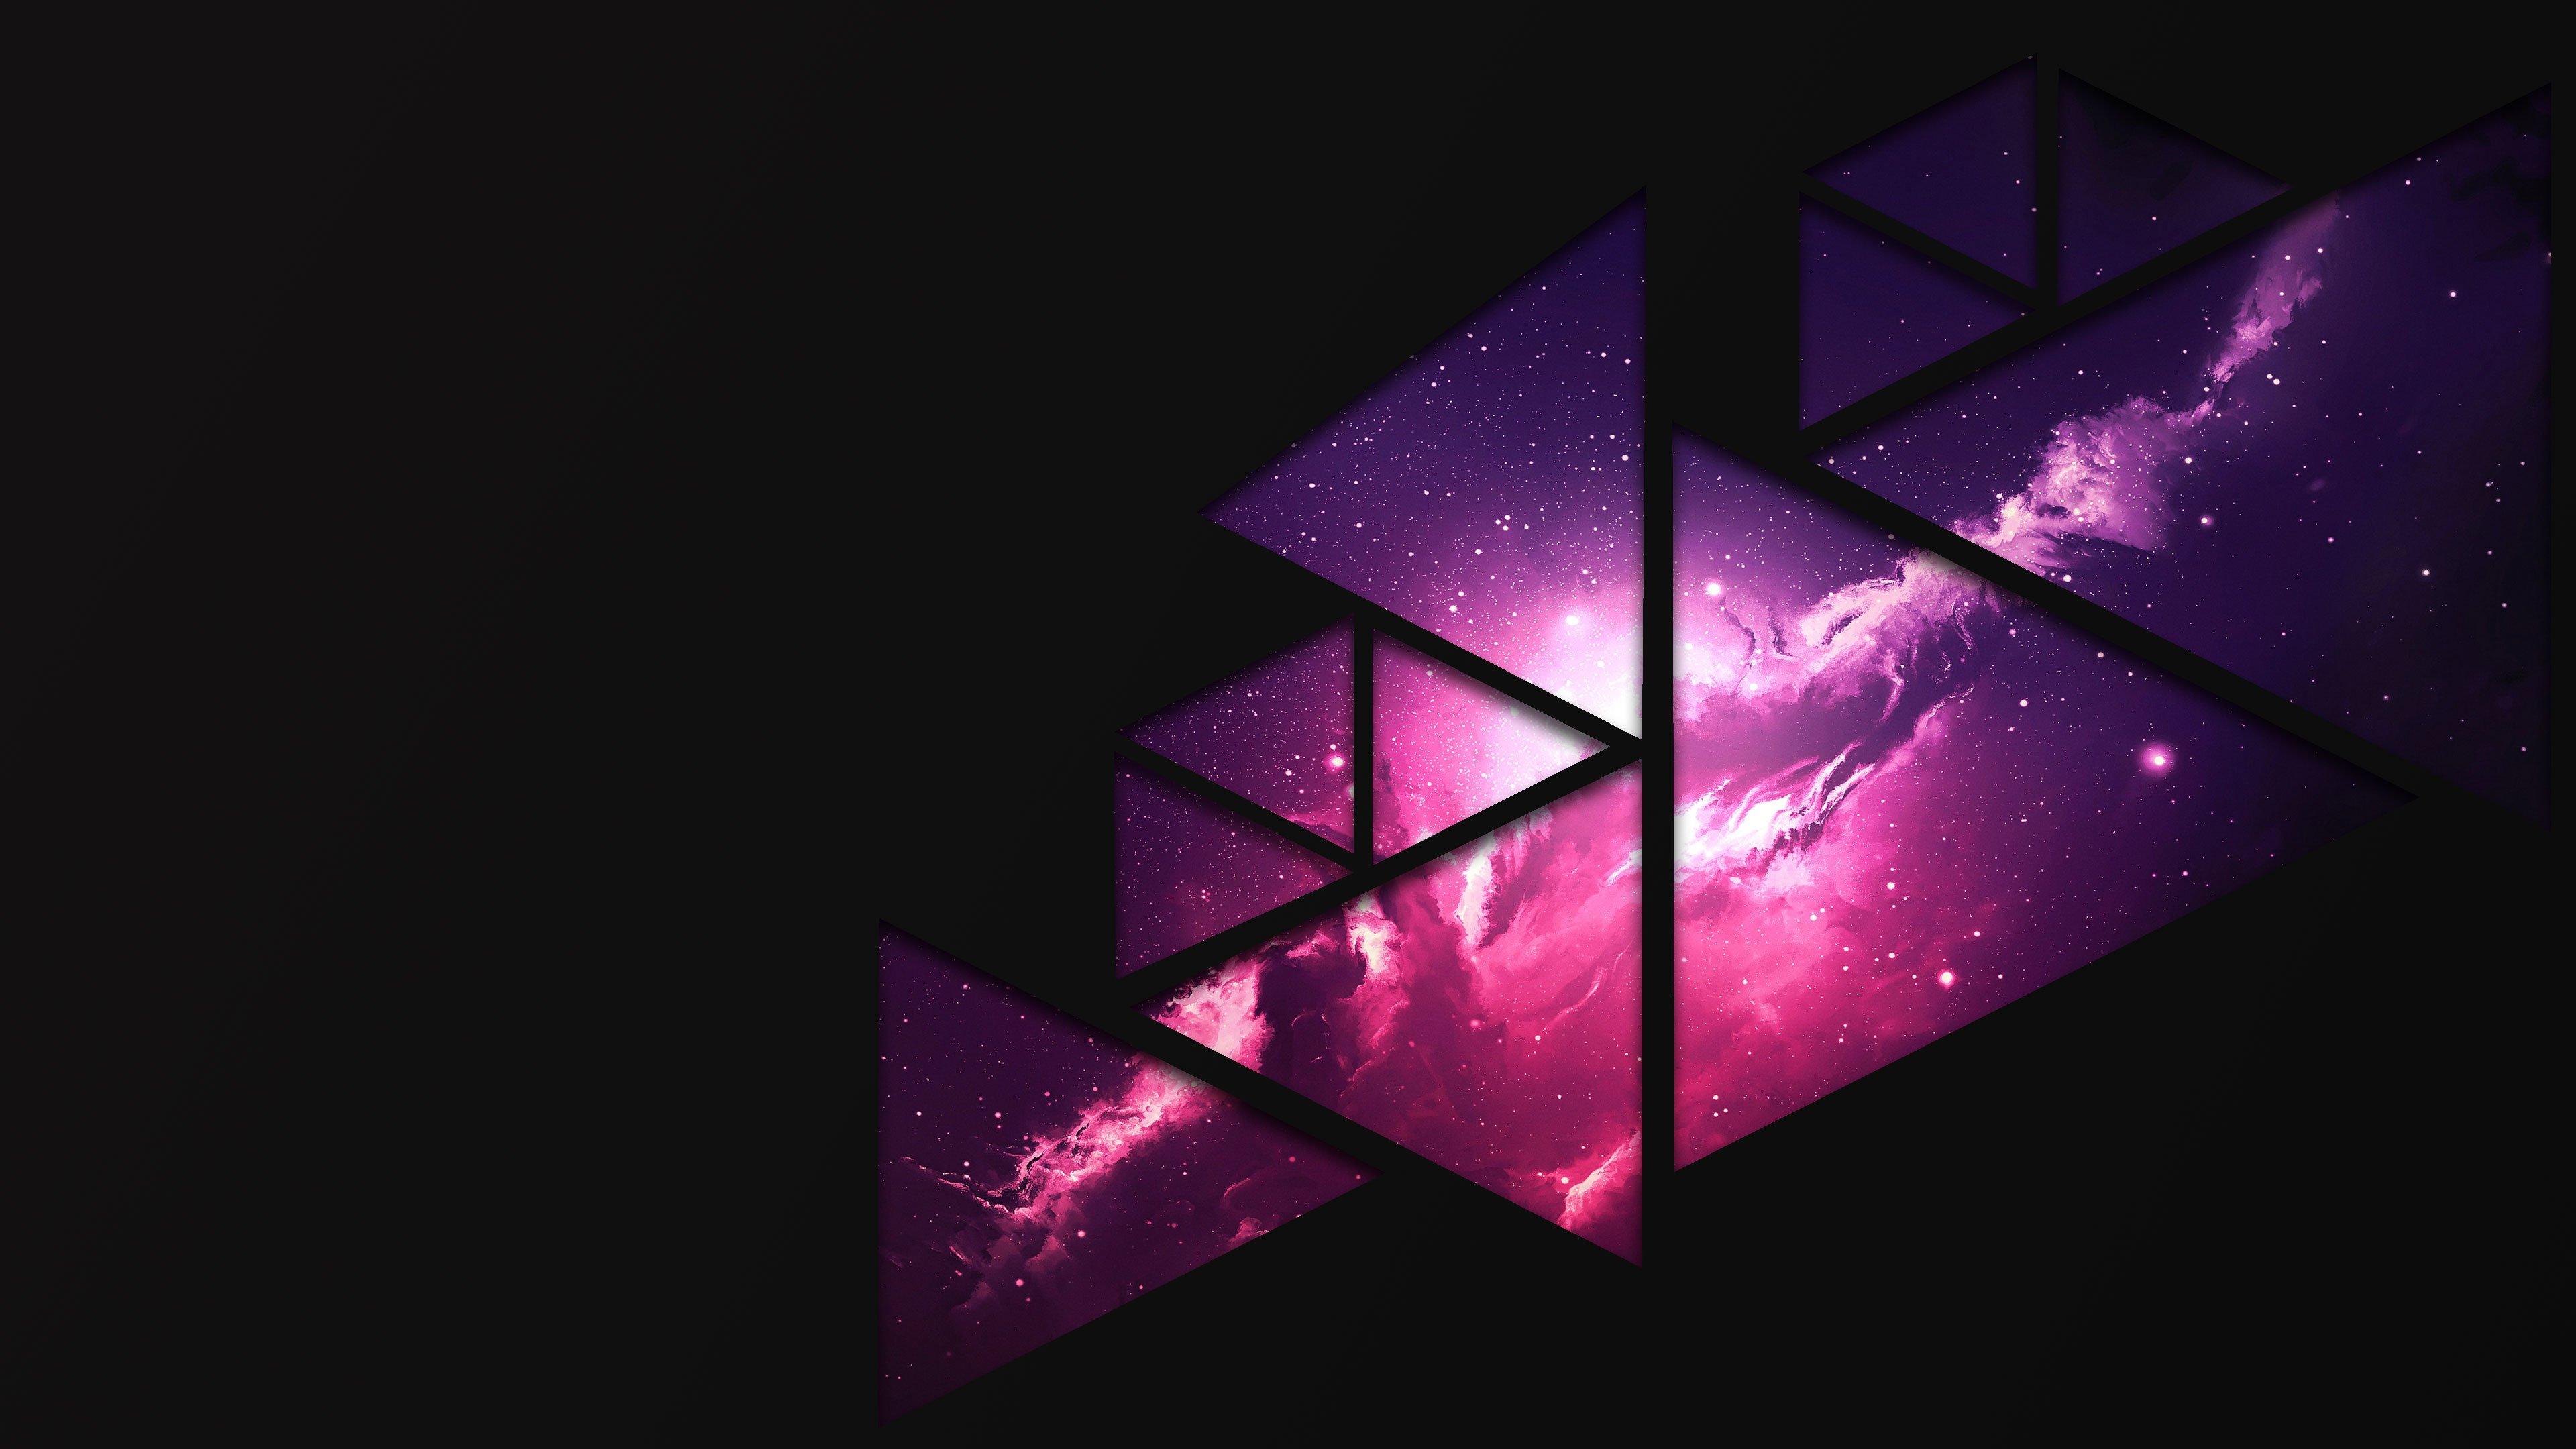 Fractal Space Wallpaper - Space Wallpaper 8k Purple , HD Wallpaper & Backgrounds